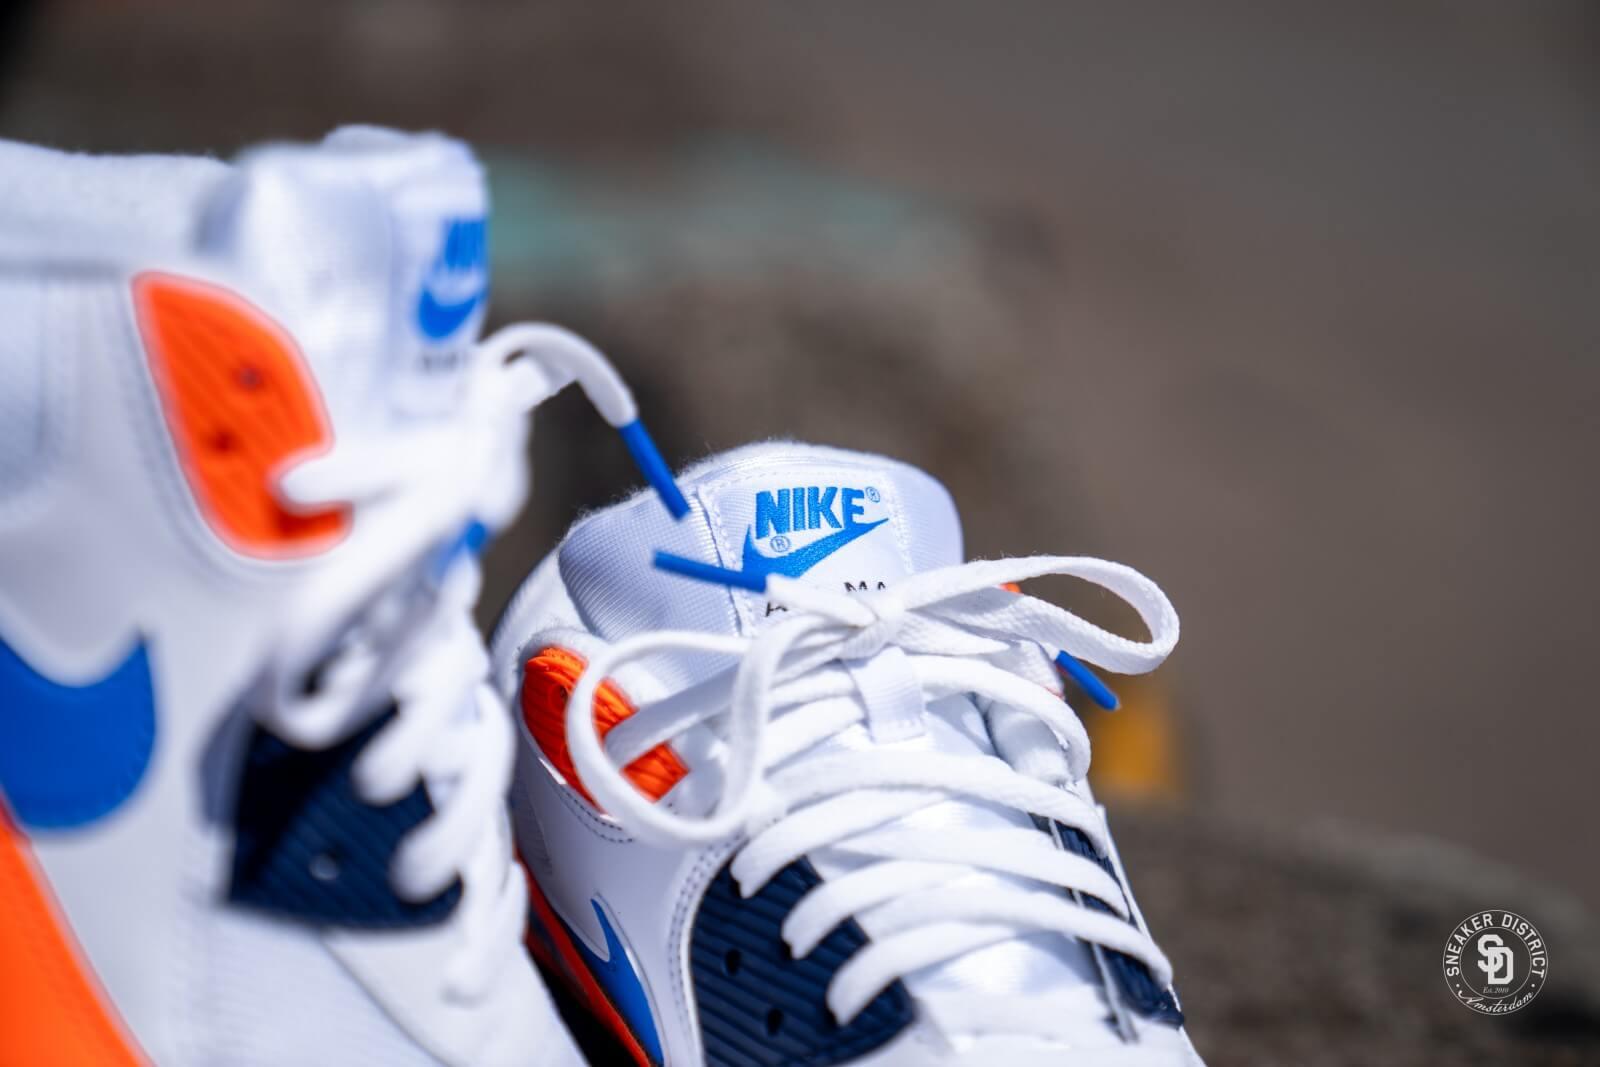 air max 90 orange and blue